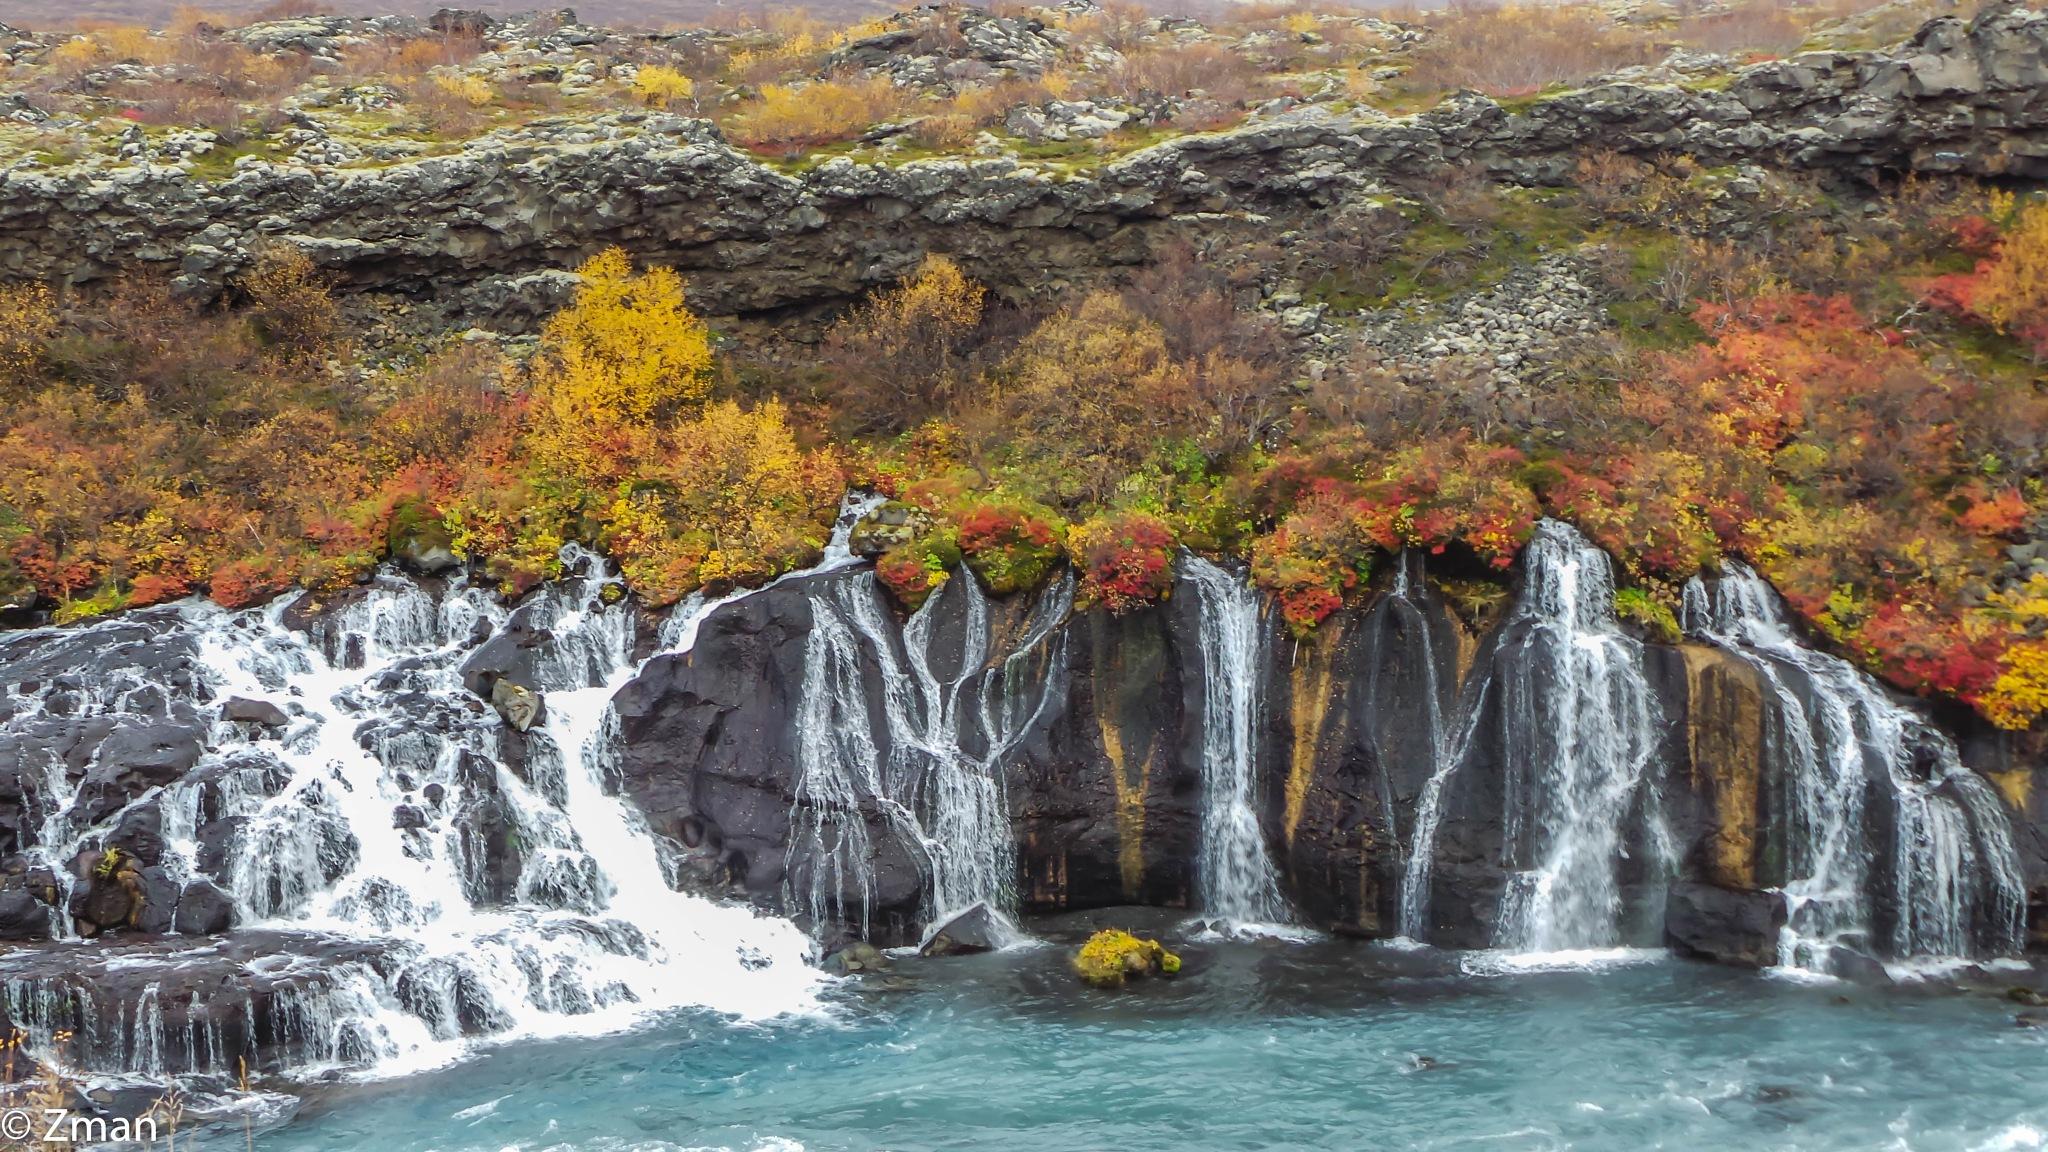 The waterfalls of Hraunfossar by muhammad.nasser.963